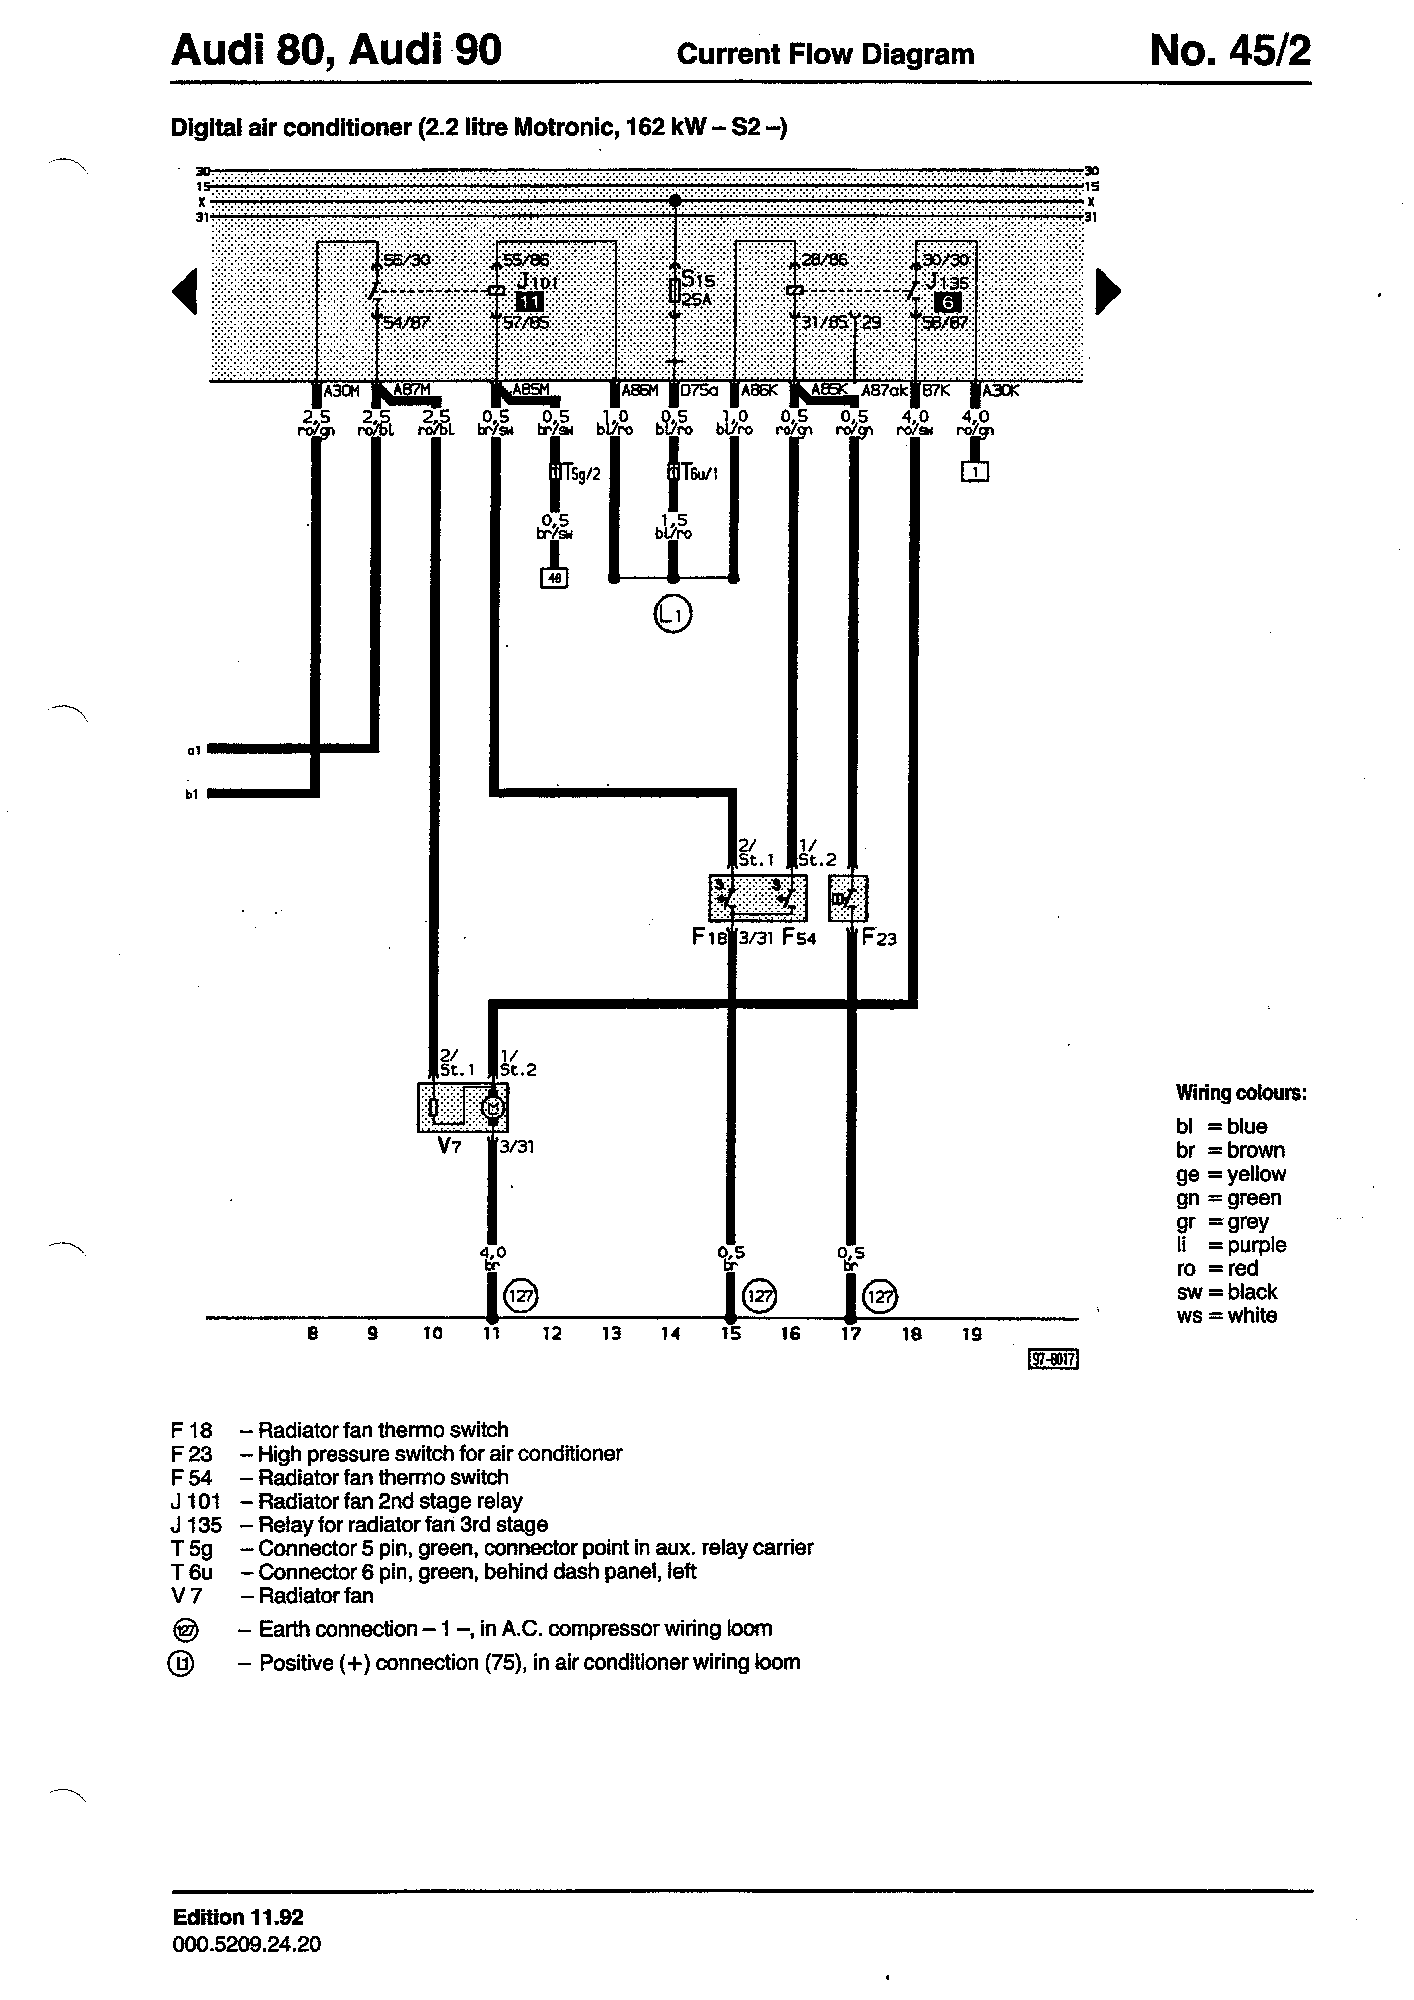 New Audi A4 Air Conditioning Wiring Diagram #diagram #diagramtemplate  #diagramsamplePinterest